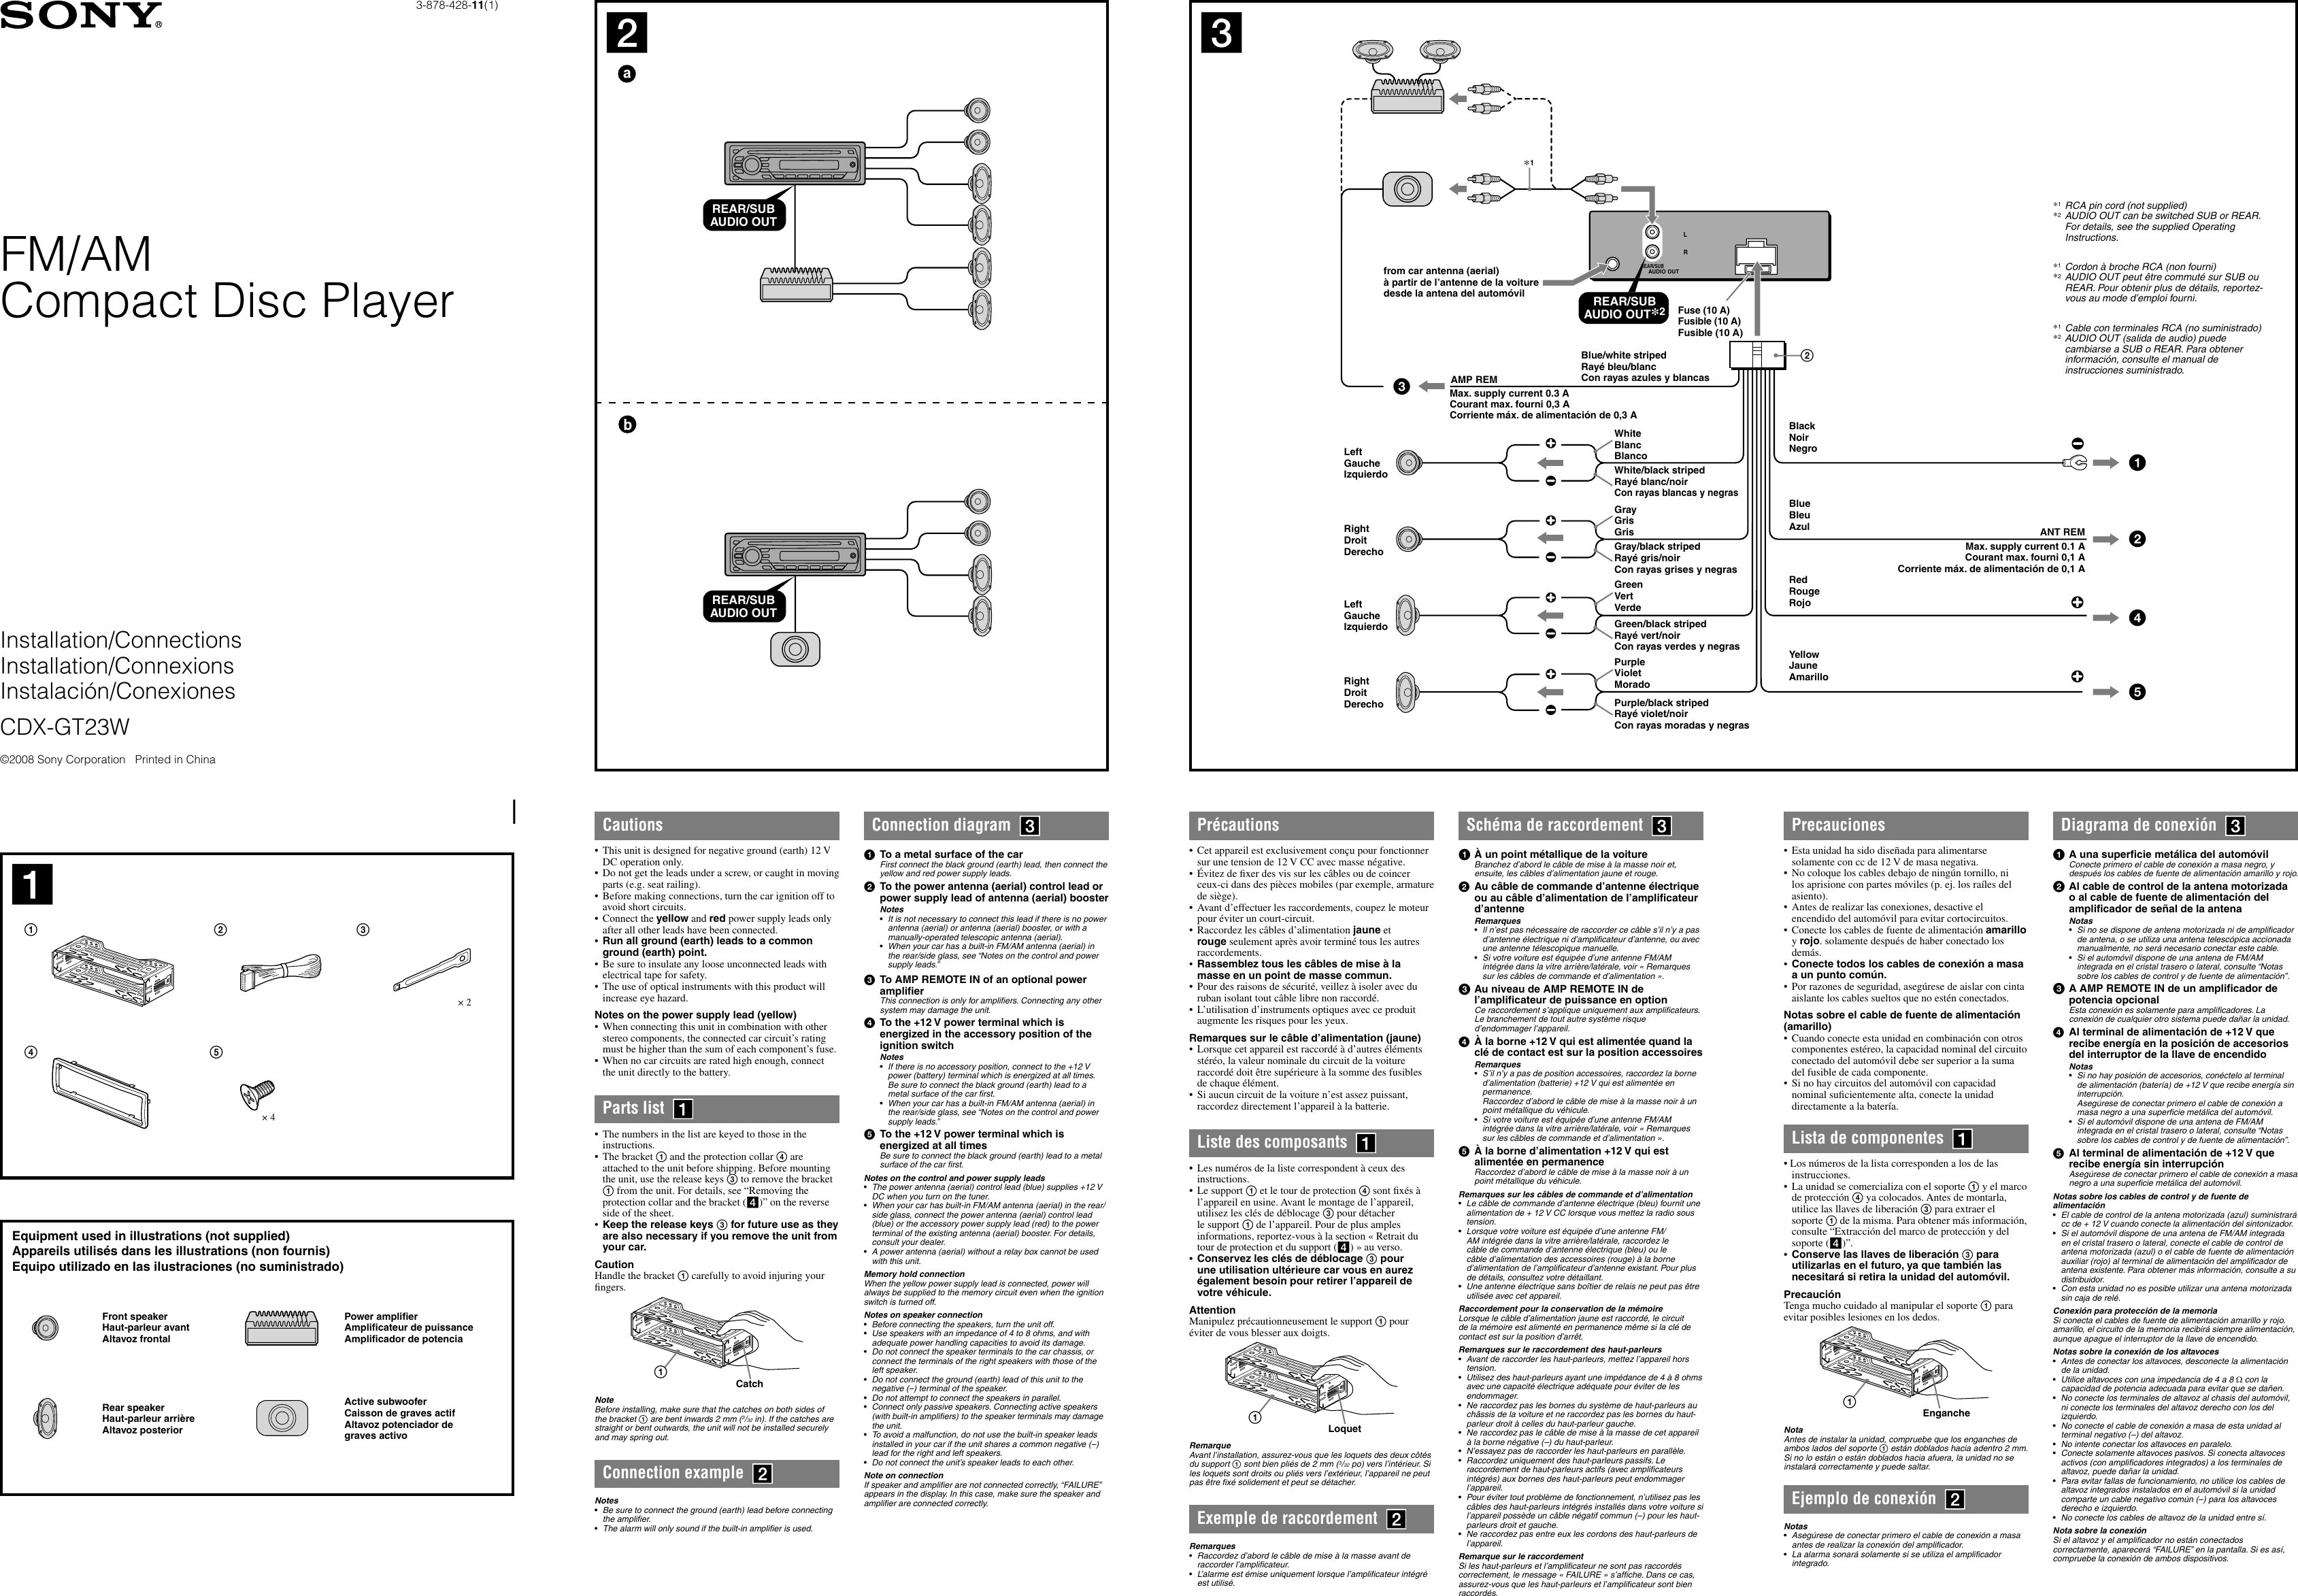 Page 1 of 2 - Sony Sony-Cdx-Gt23W-Installation-Connections-Manual- CDX-GT23W  Sony-cdx-gt23w-installation-connections-manual